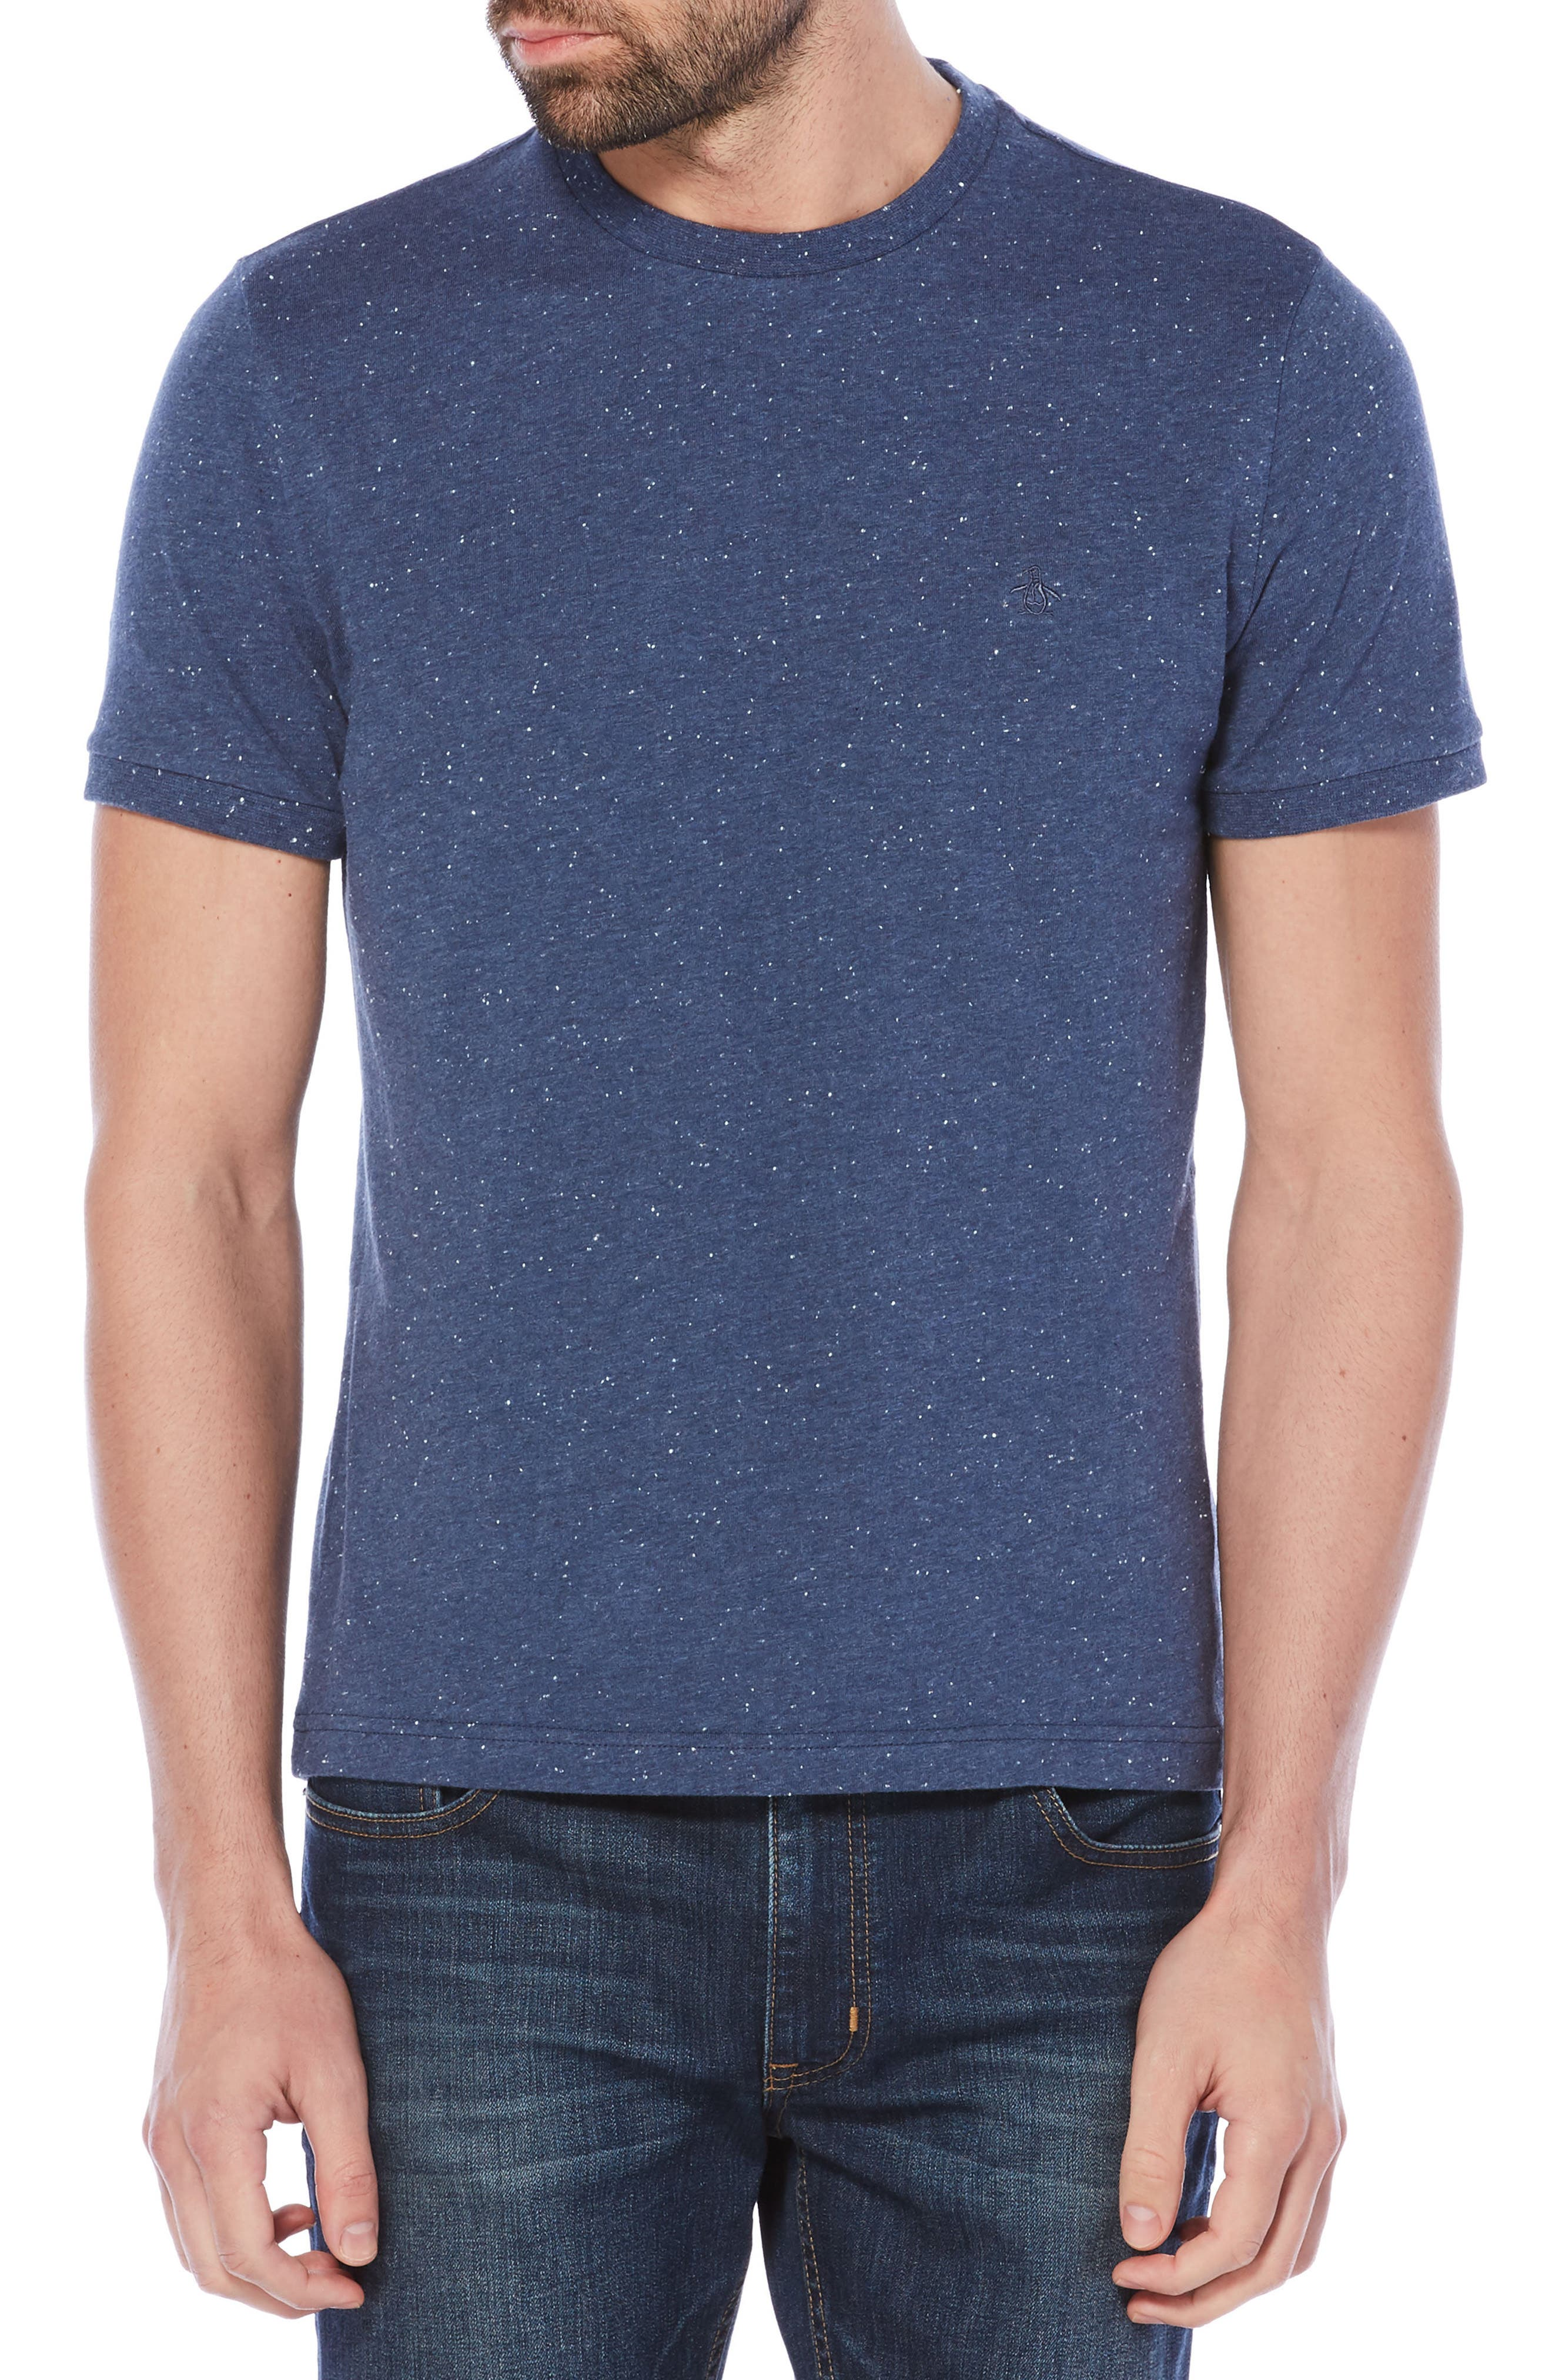 Main Image - Original Penguin Nep Speckled T-Shirt